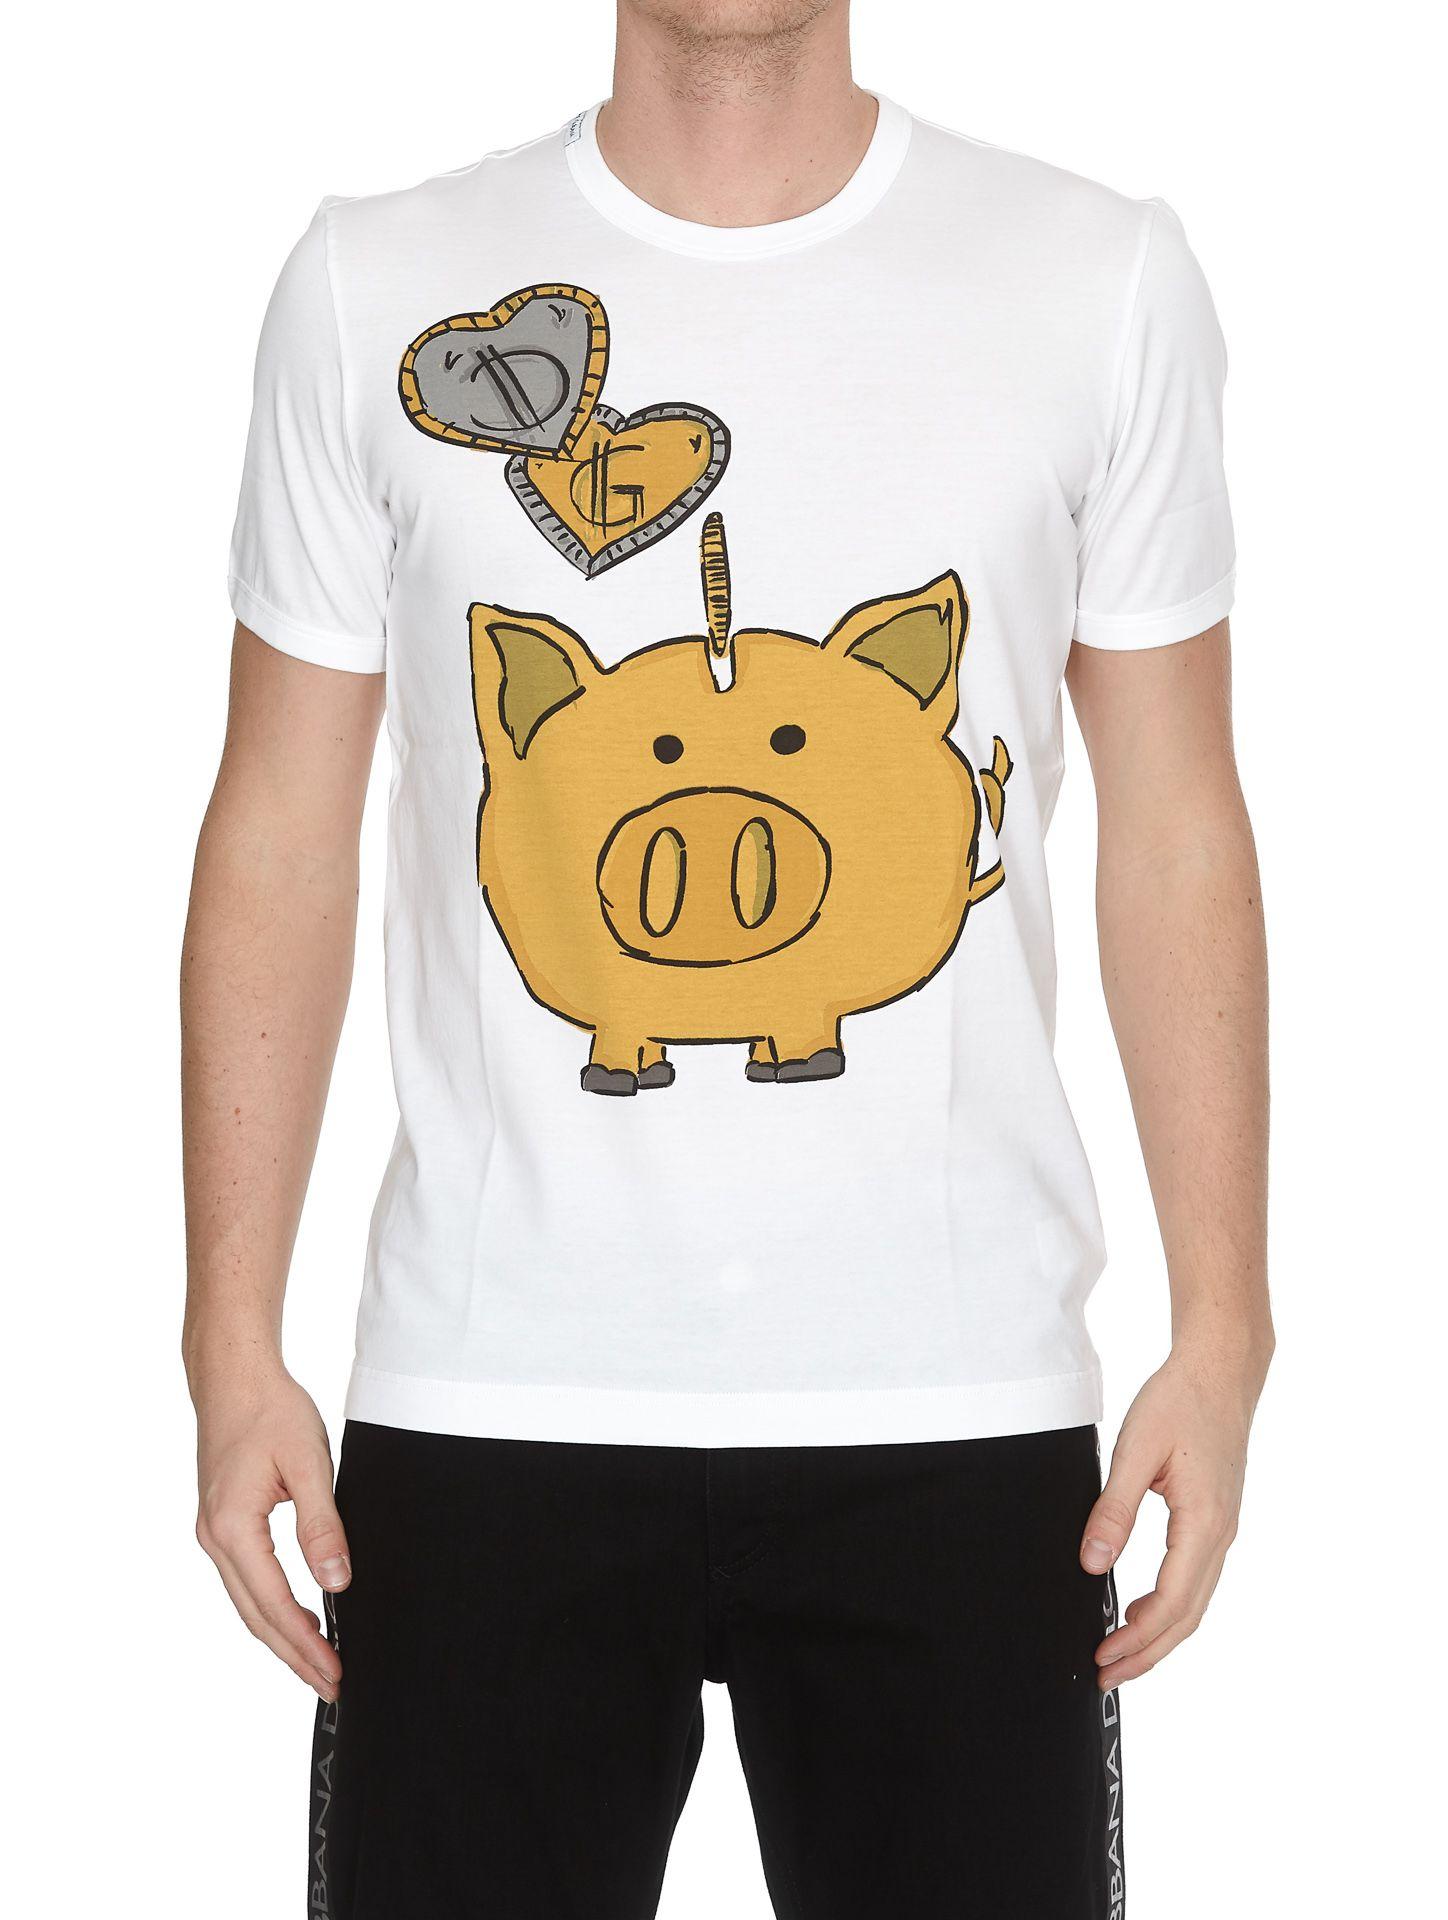 Dolce & Gabbana Chinese New Year T-shirt